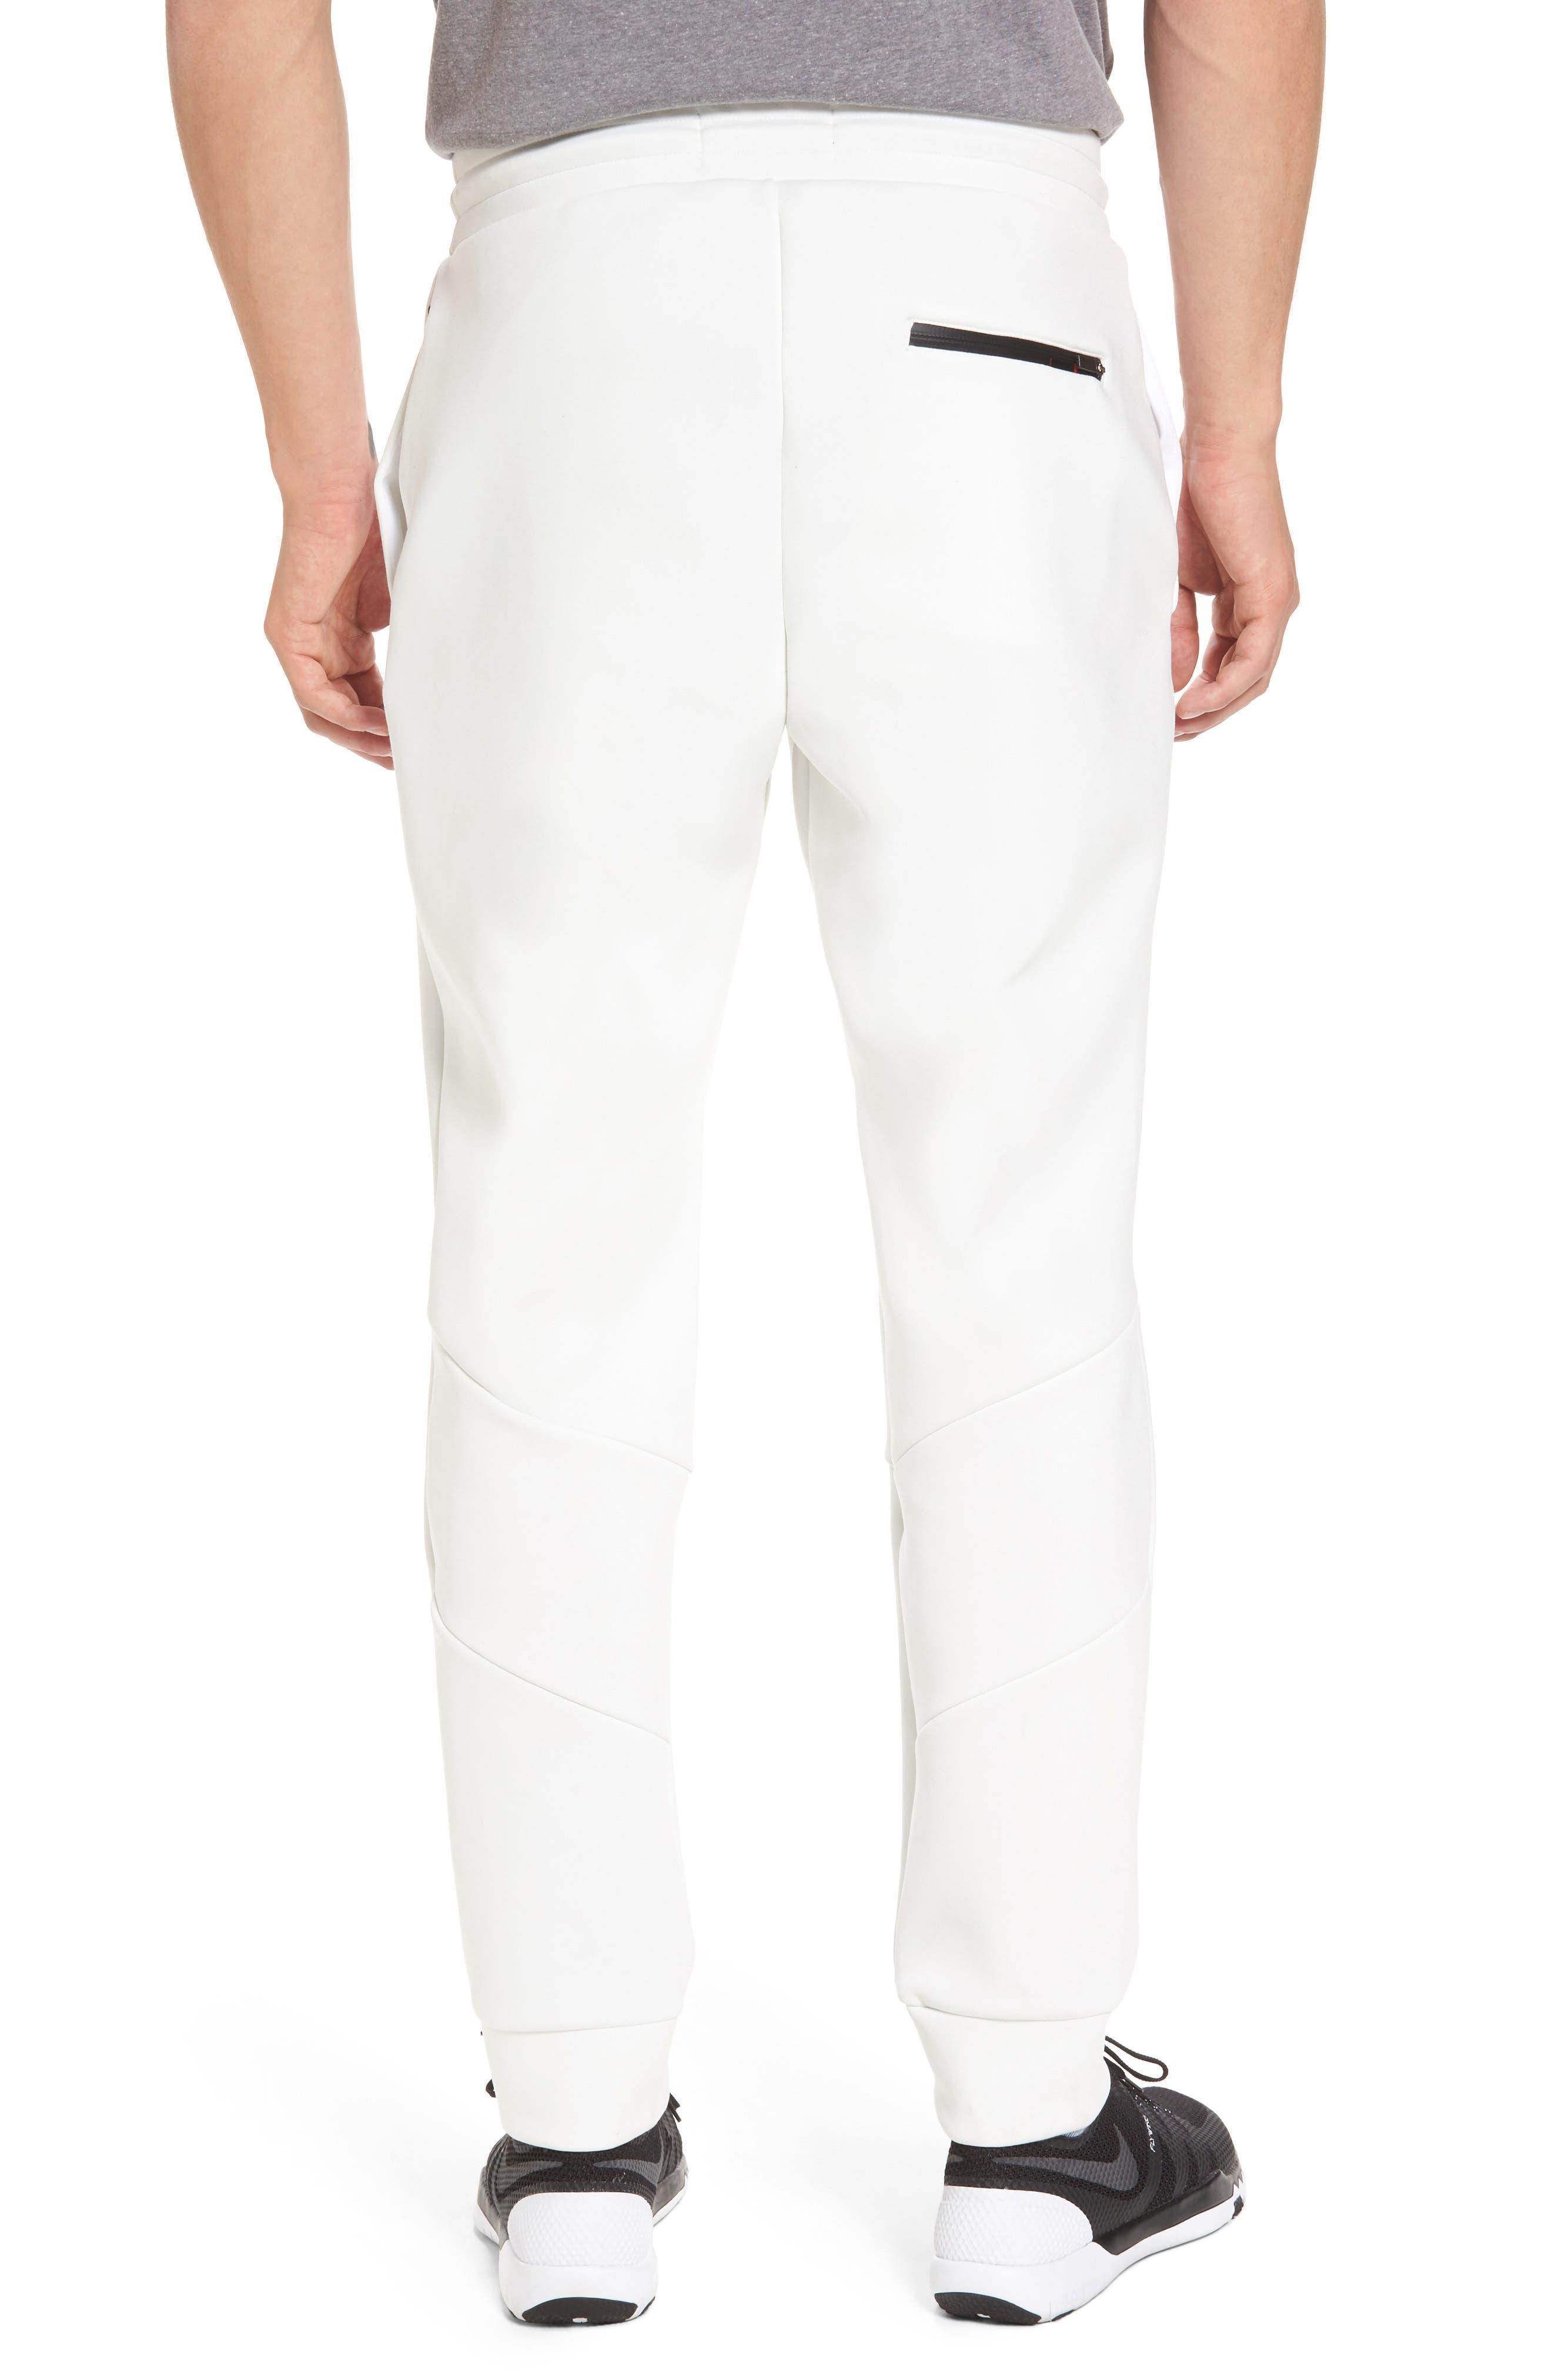 Sportswear Flight Tech Pants,                             Alternate thumbnail 2, color,                             Summit White/ Black